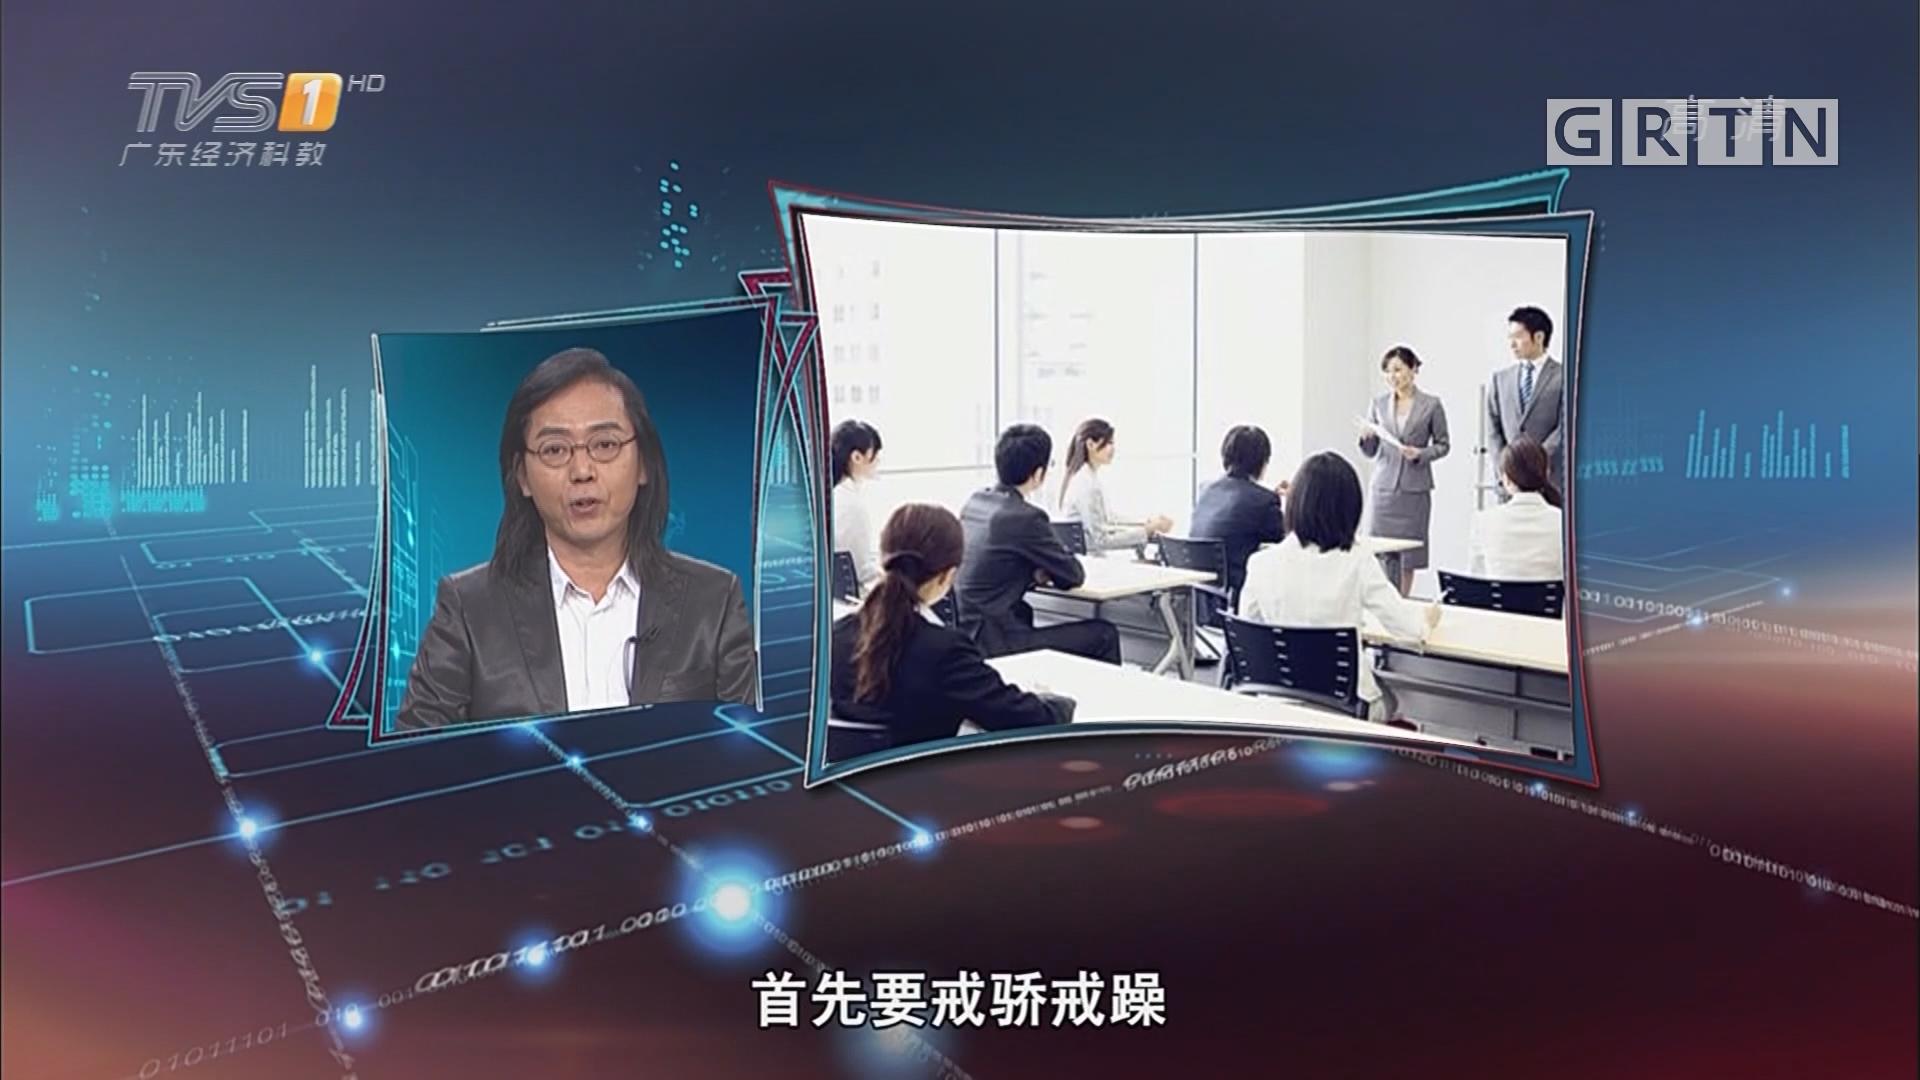 [HD][2019-01-15]马后炮:初入职场的年轻人 多涵养学徒心态